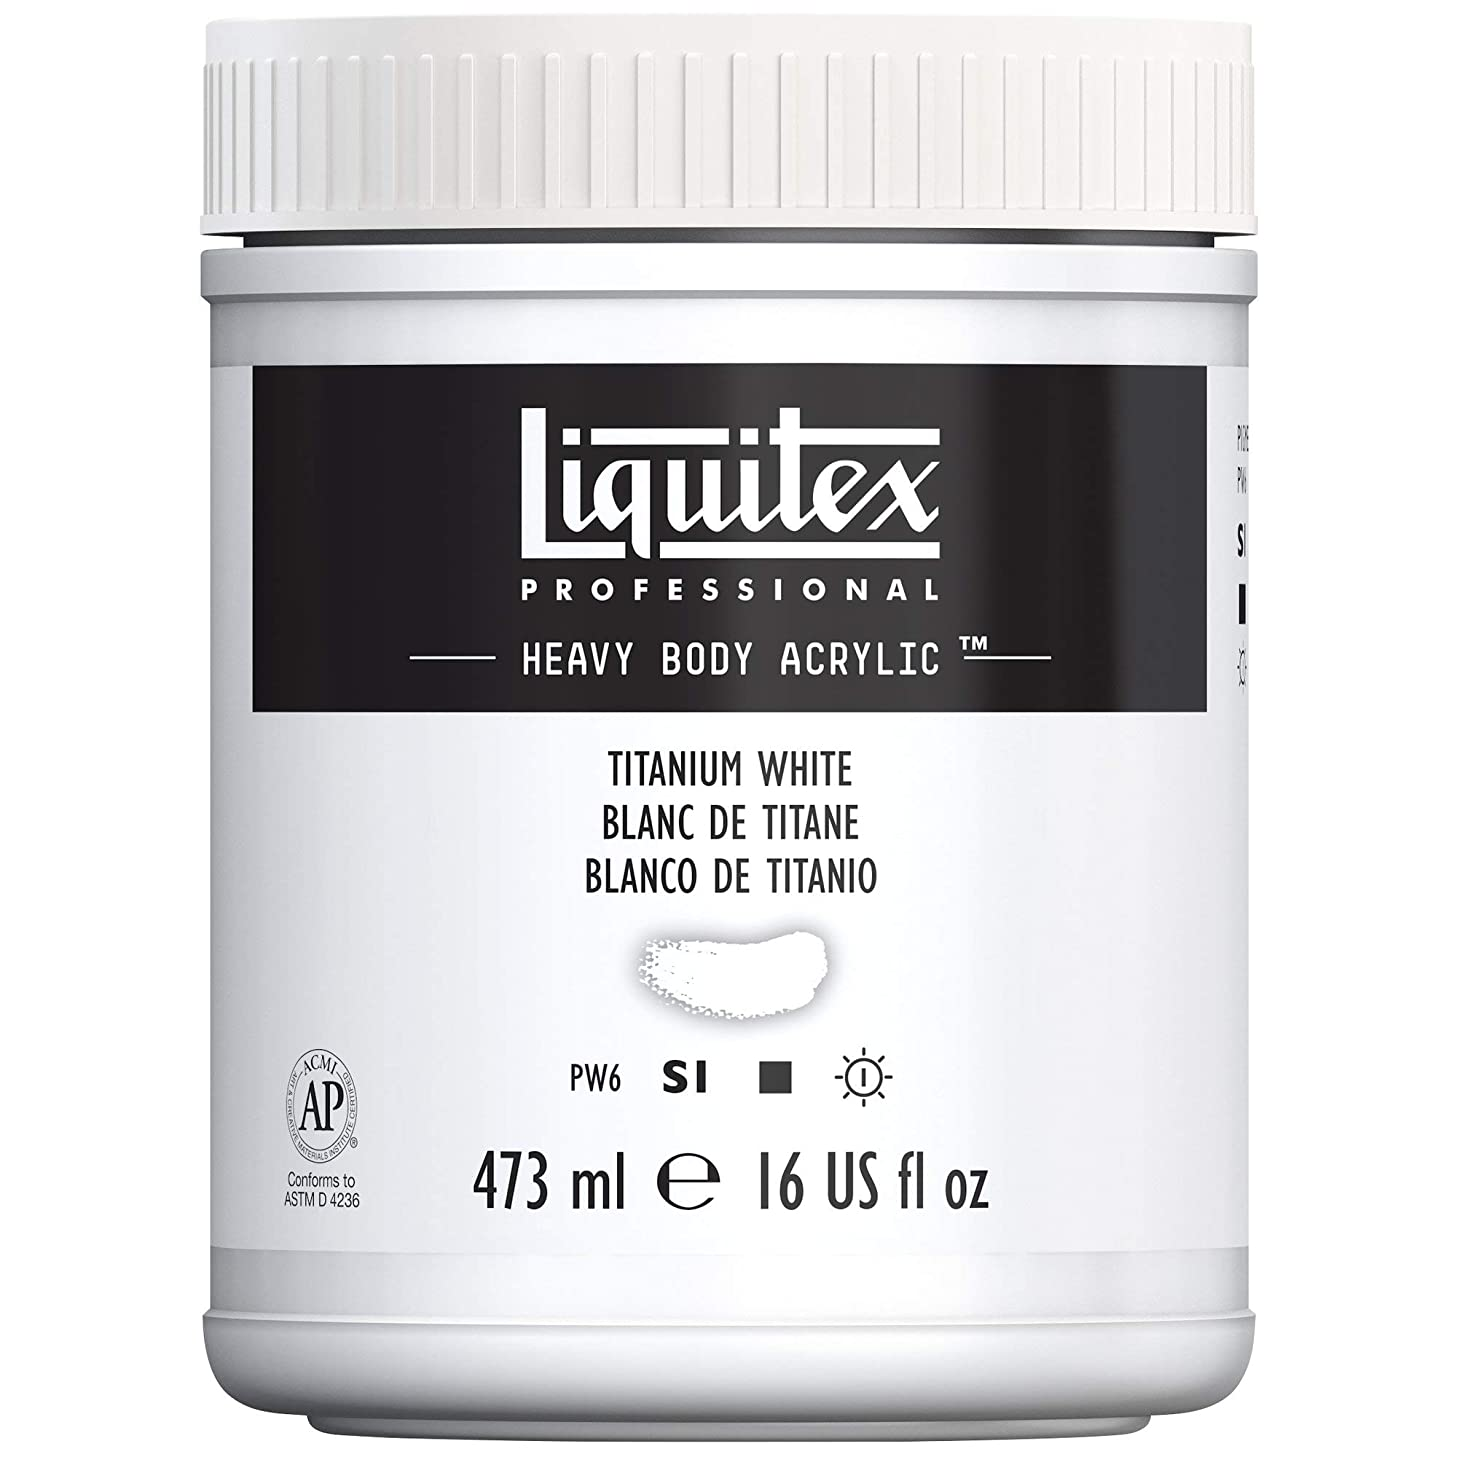 Liquitex Professional Heavy Body Acrylic Paint, 16-oz Jar, Titanium White